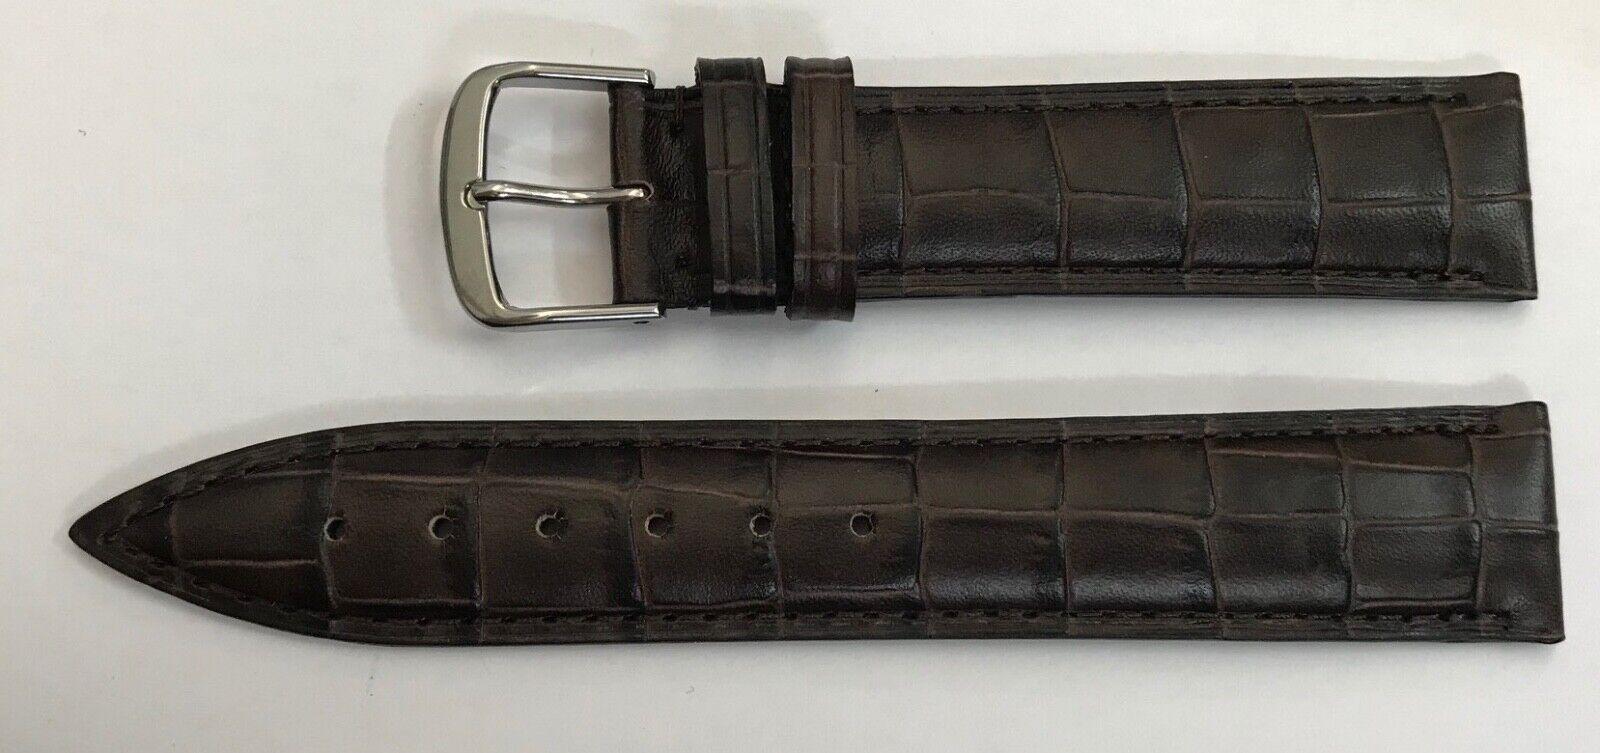 18mm Uhrenarmband Frederique Constant Hand made Crococalf braun Dornschließe